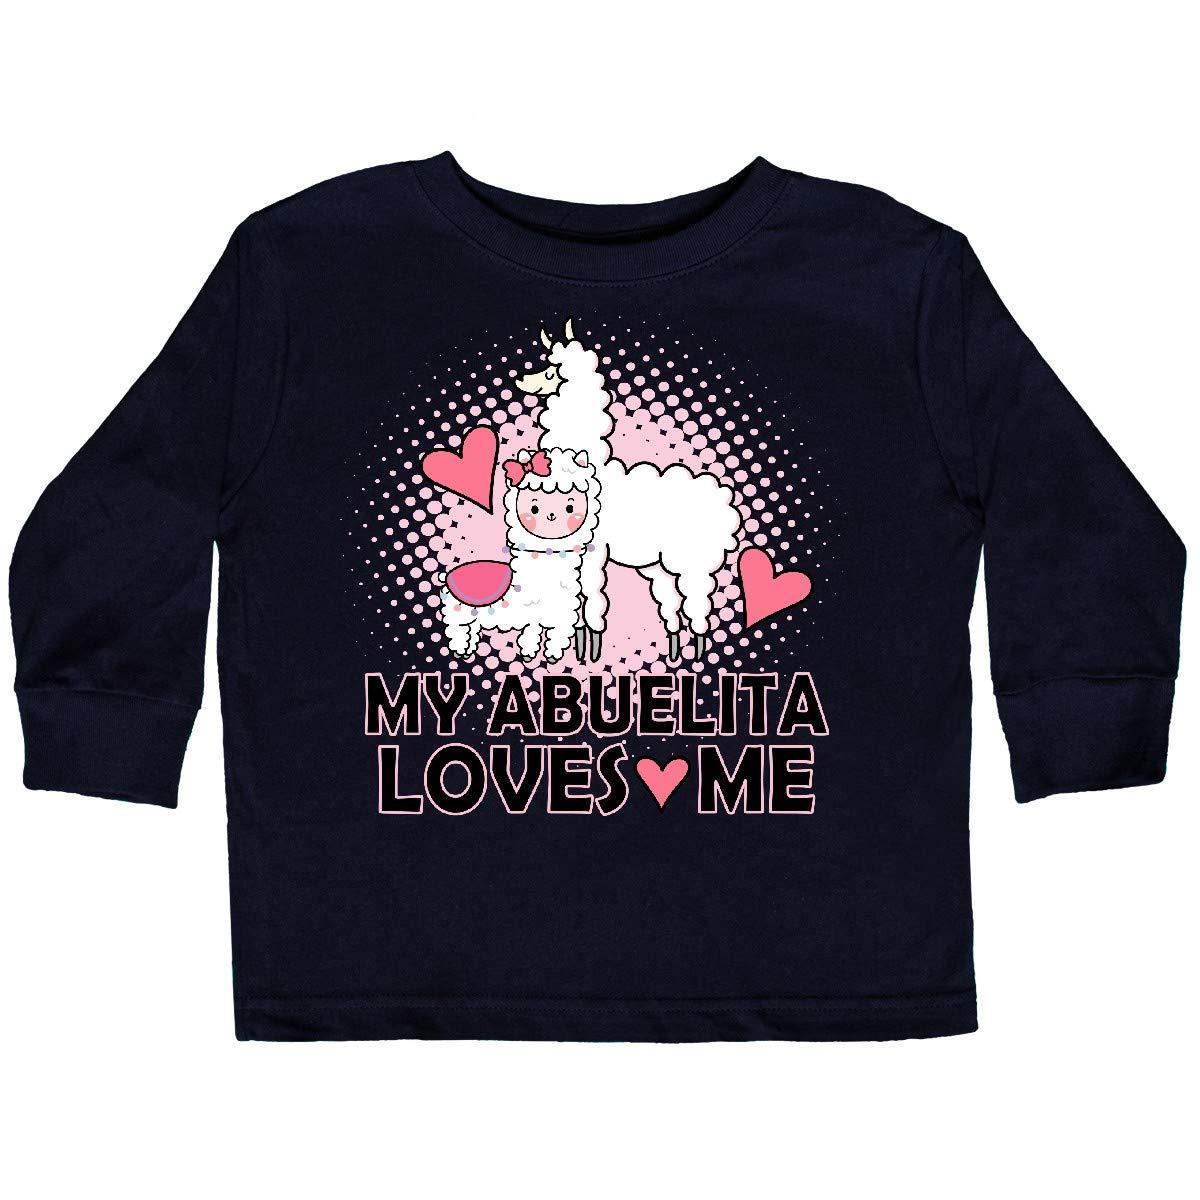 inktastic My Abuelita Loves Me Baby Llama Toddler Long Sleeve T-Shirt